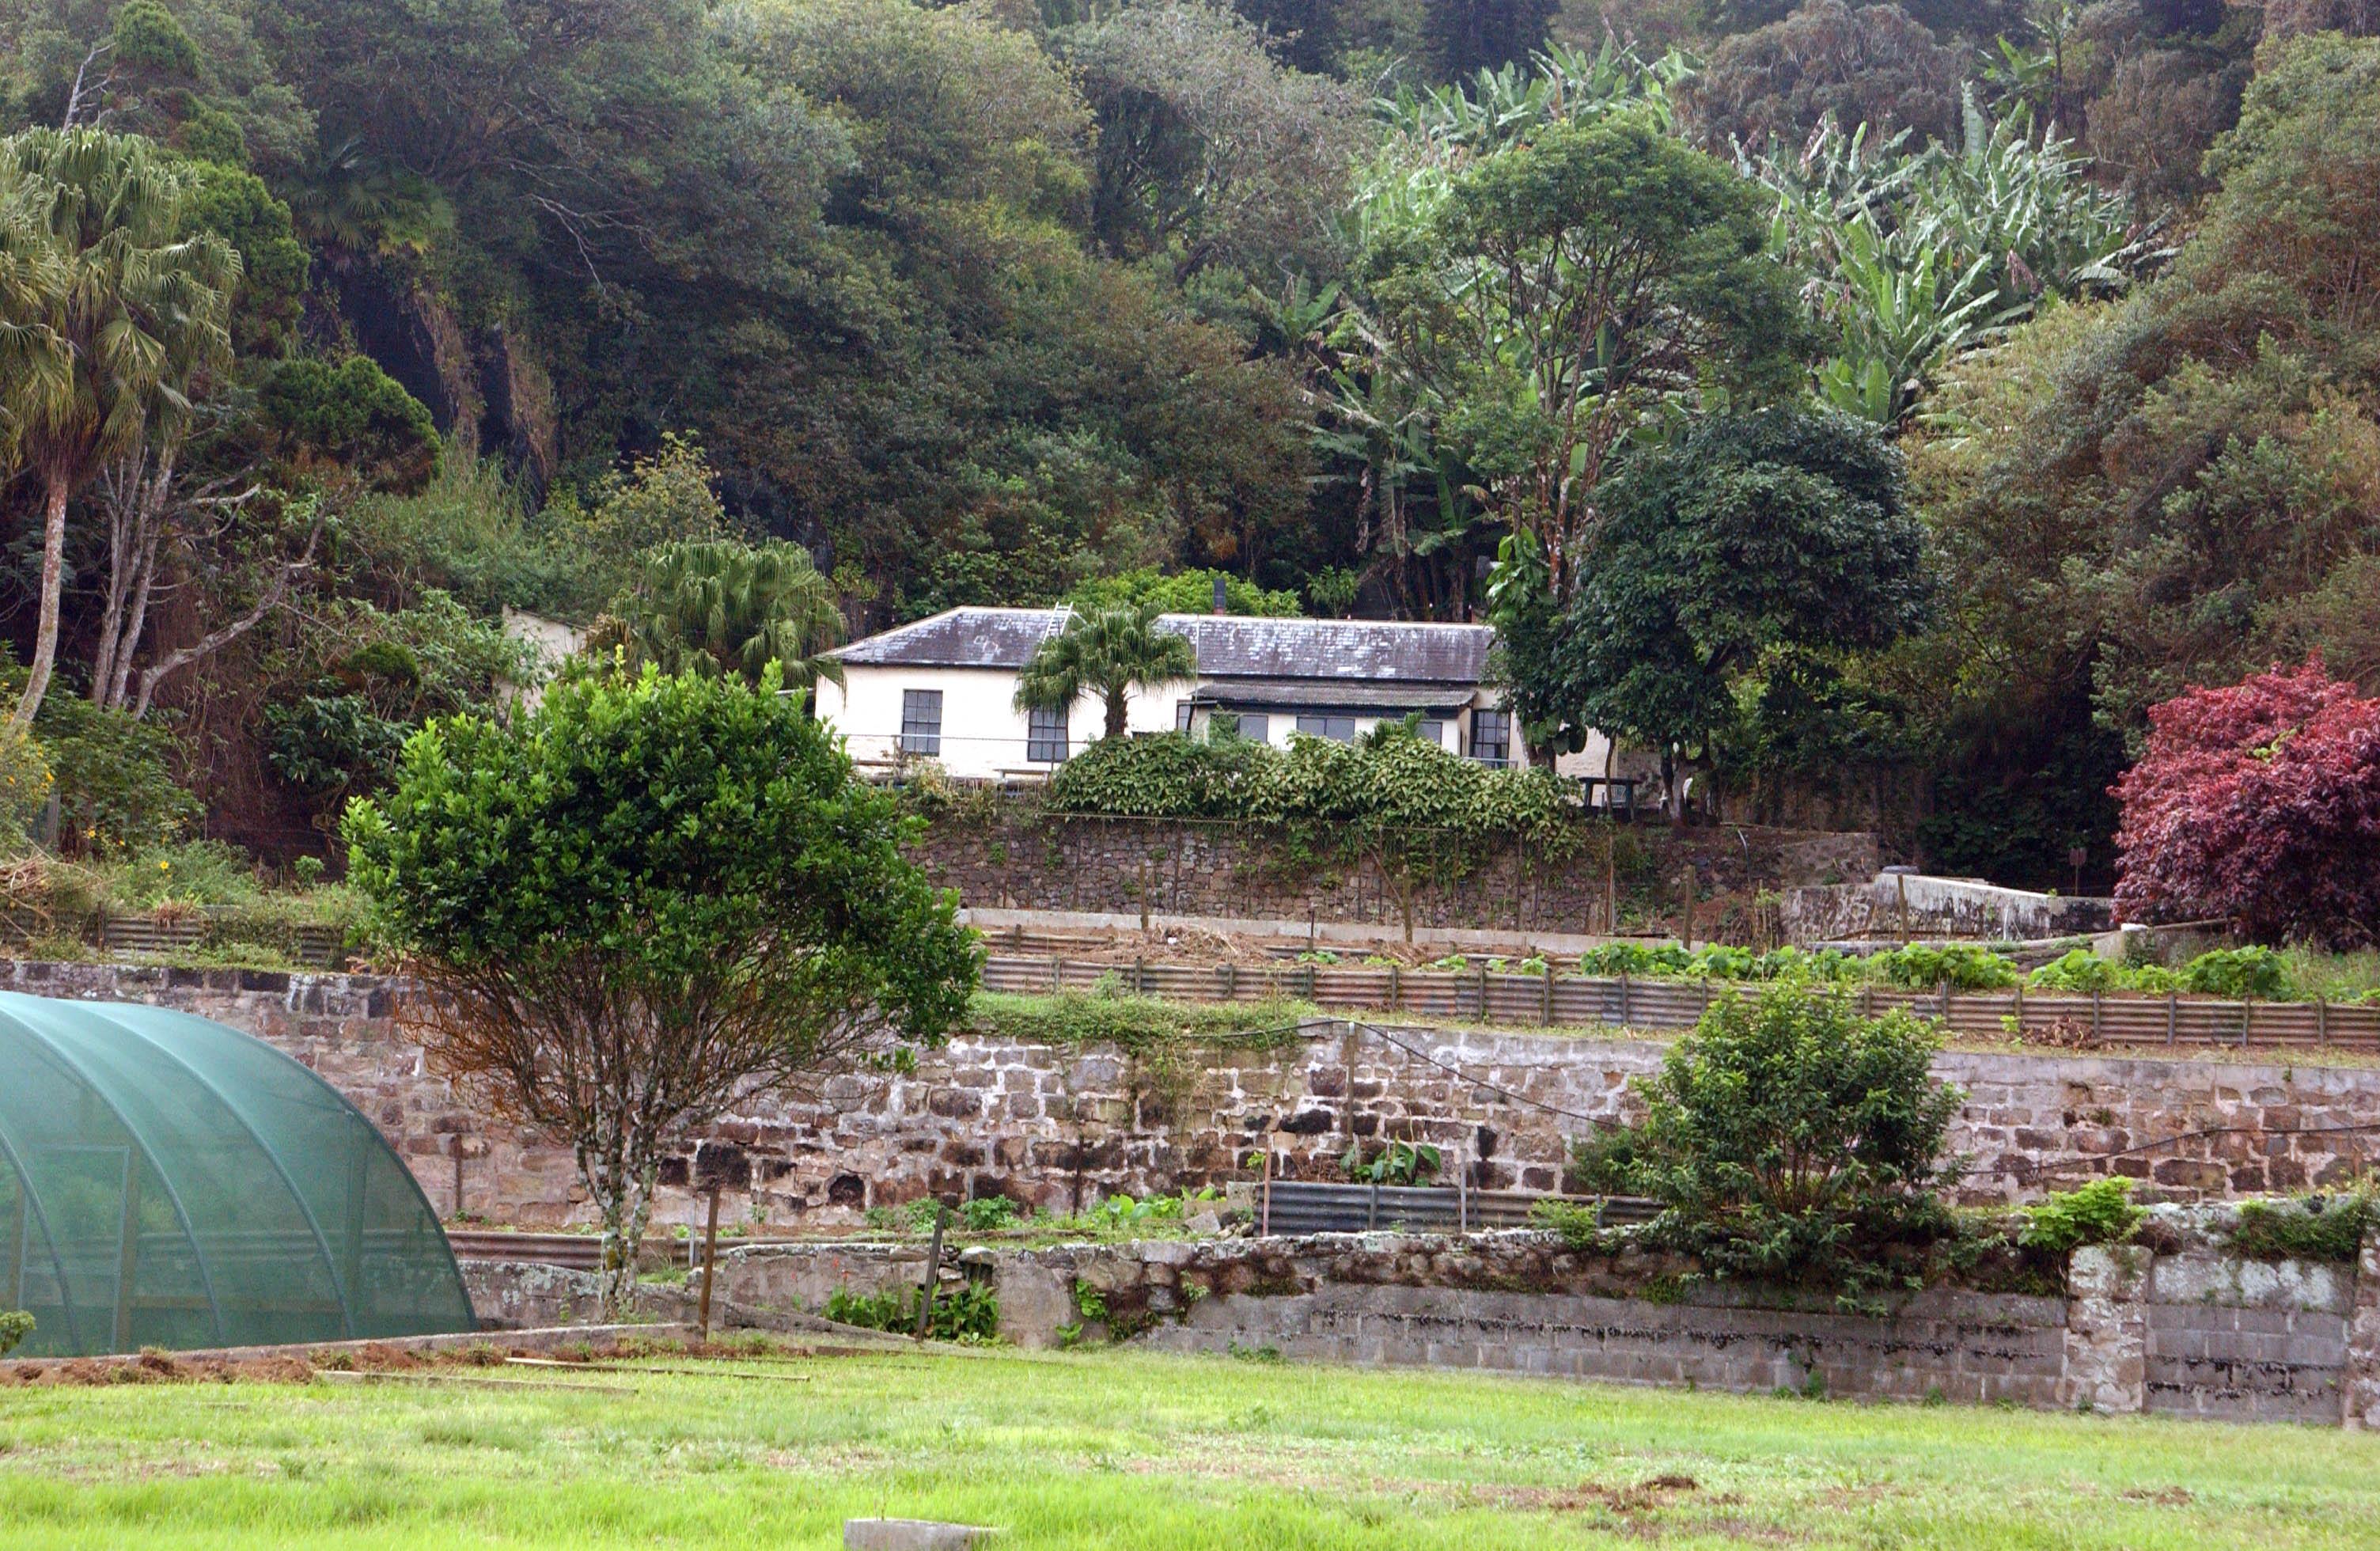 File:GREEN MOUNTAIN SETTLET - ASCENSION ISLAND.jpg - Wikimedia ...